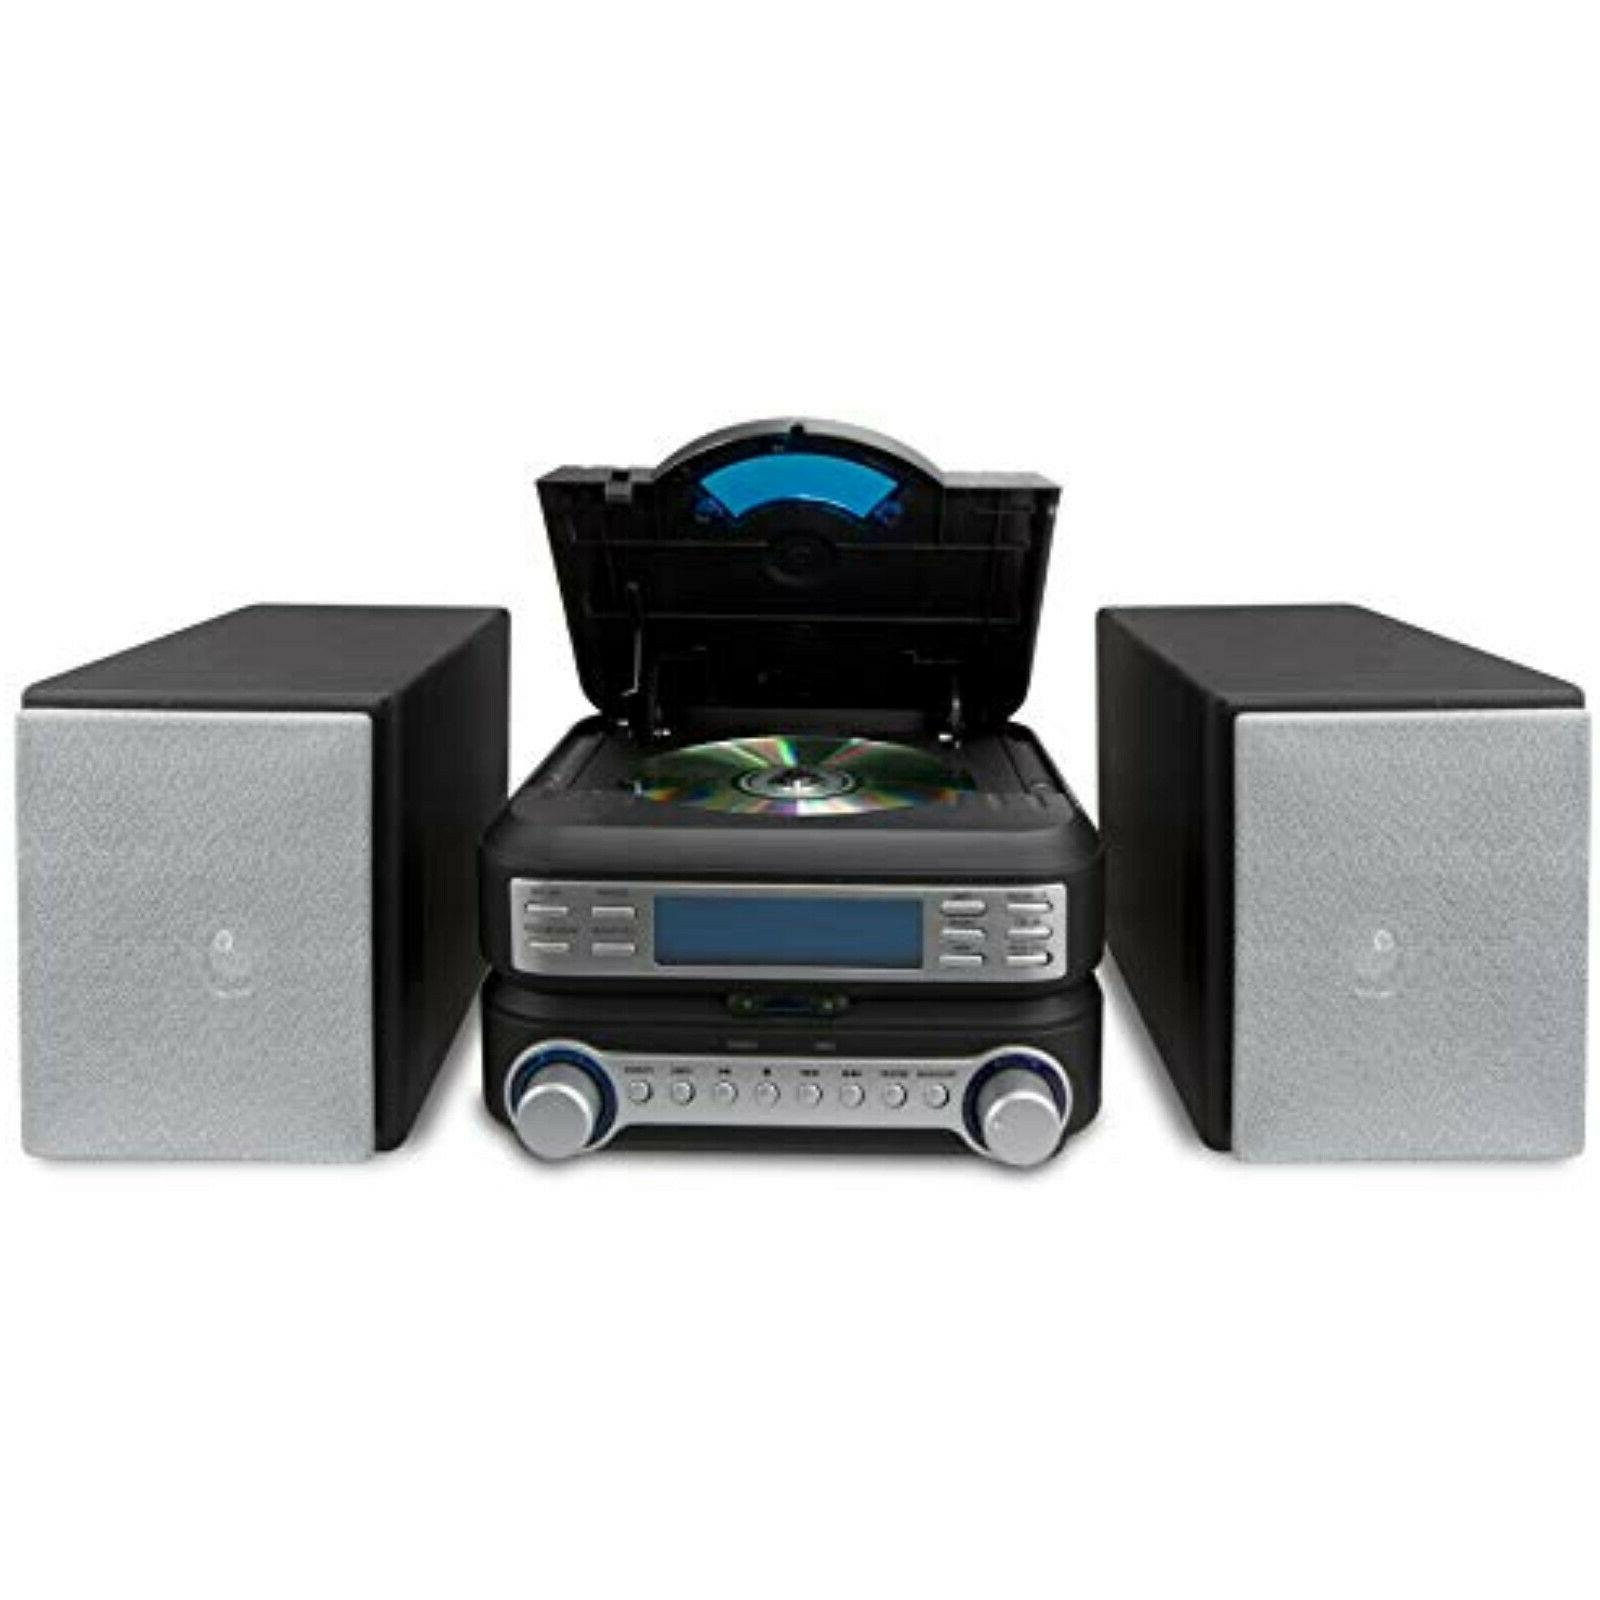 Home System FM Radio Shelf Speakers Remote